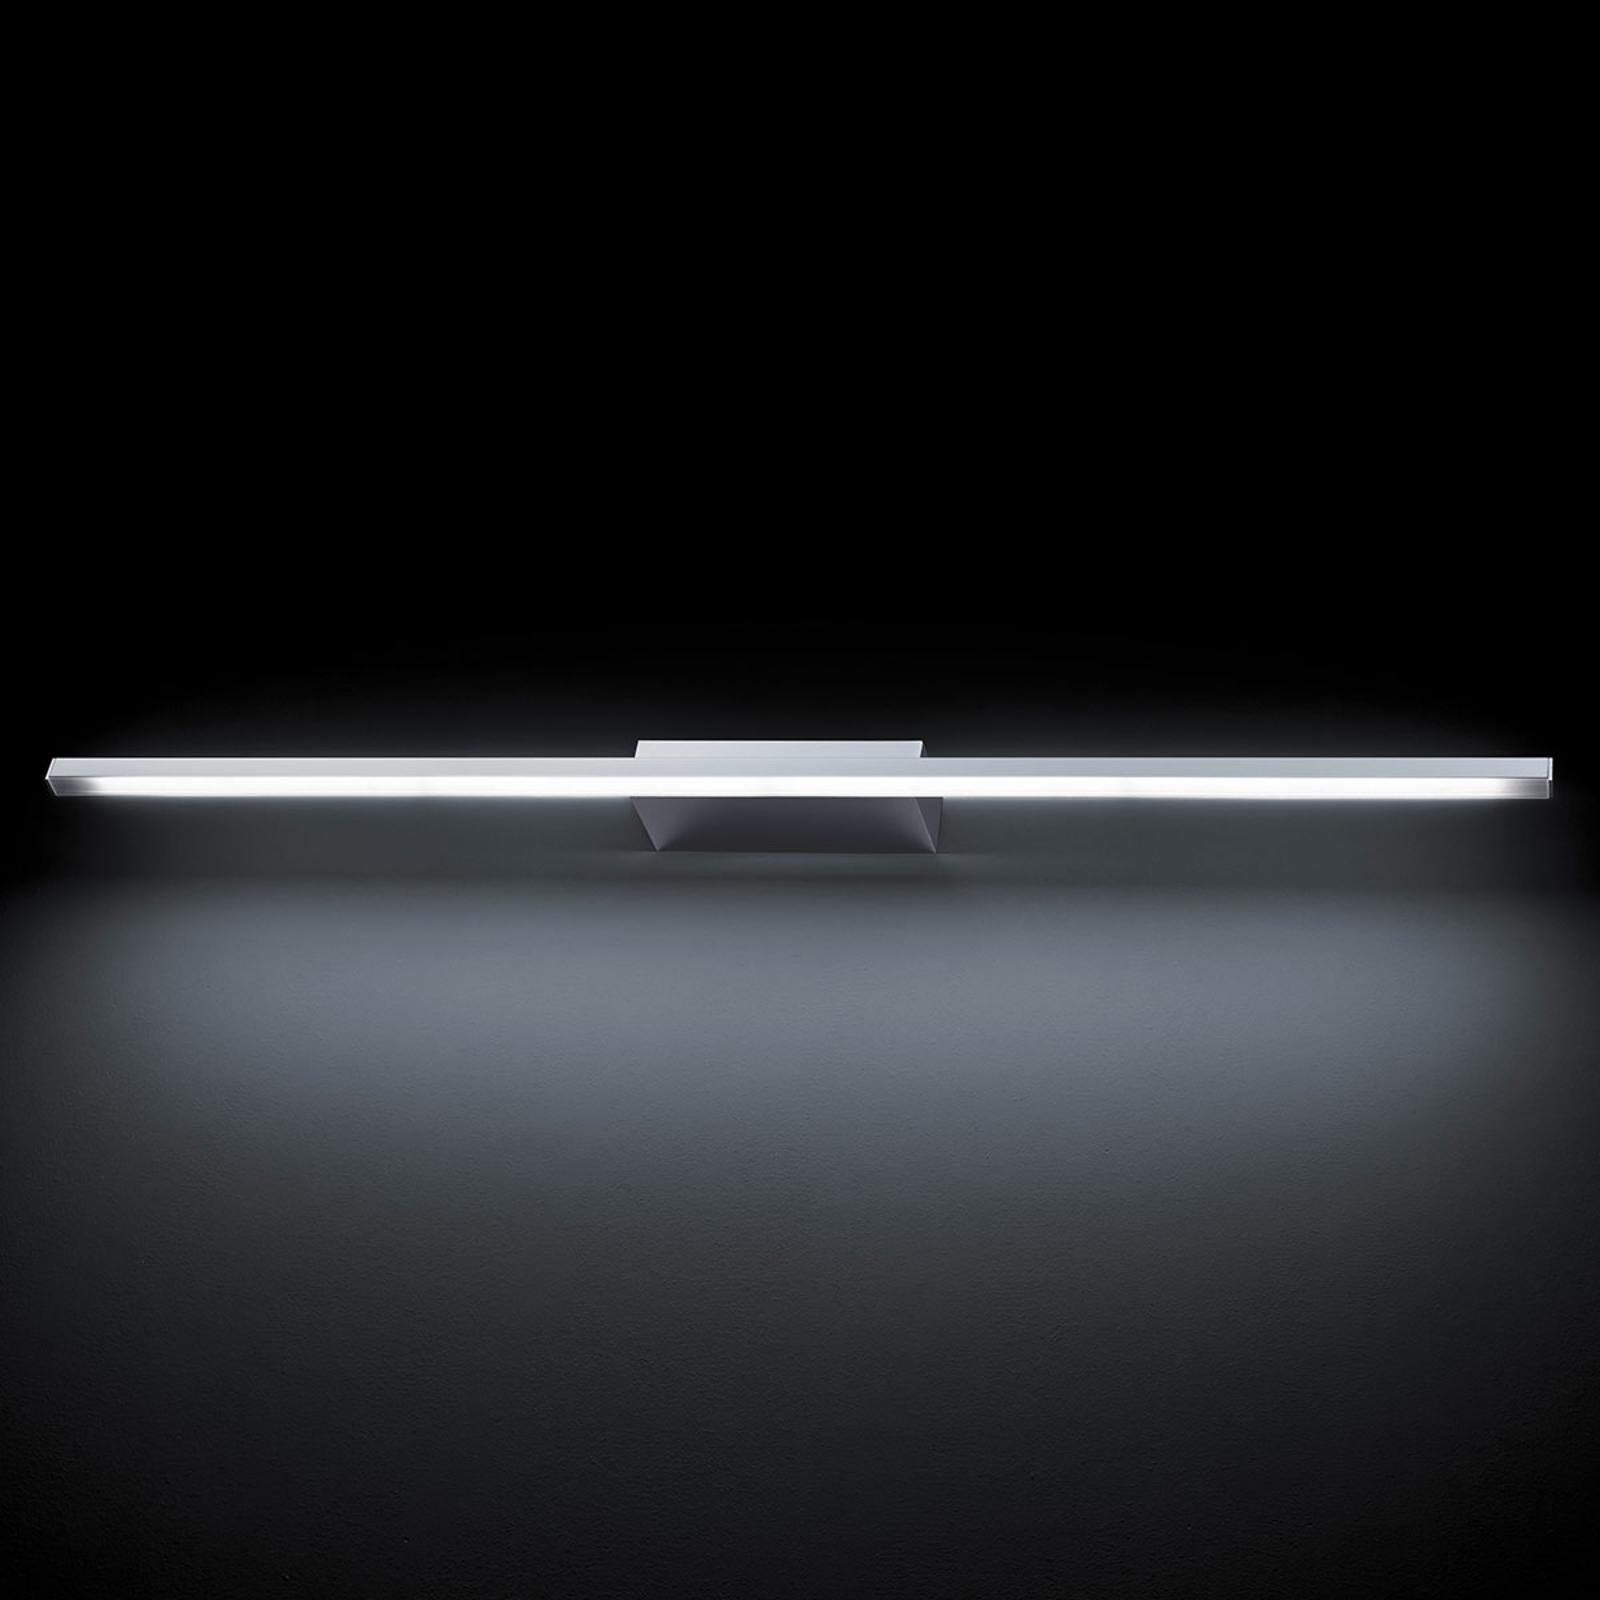 GROSSMANN Forte LED-Wandleuchte, chrom 93,6 cm